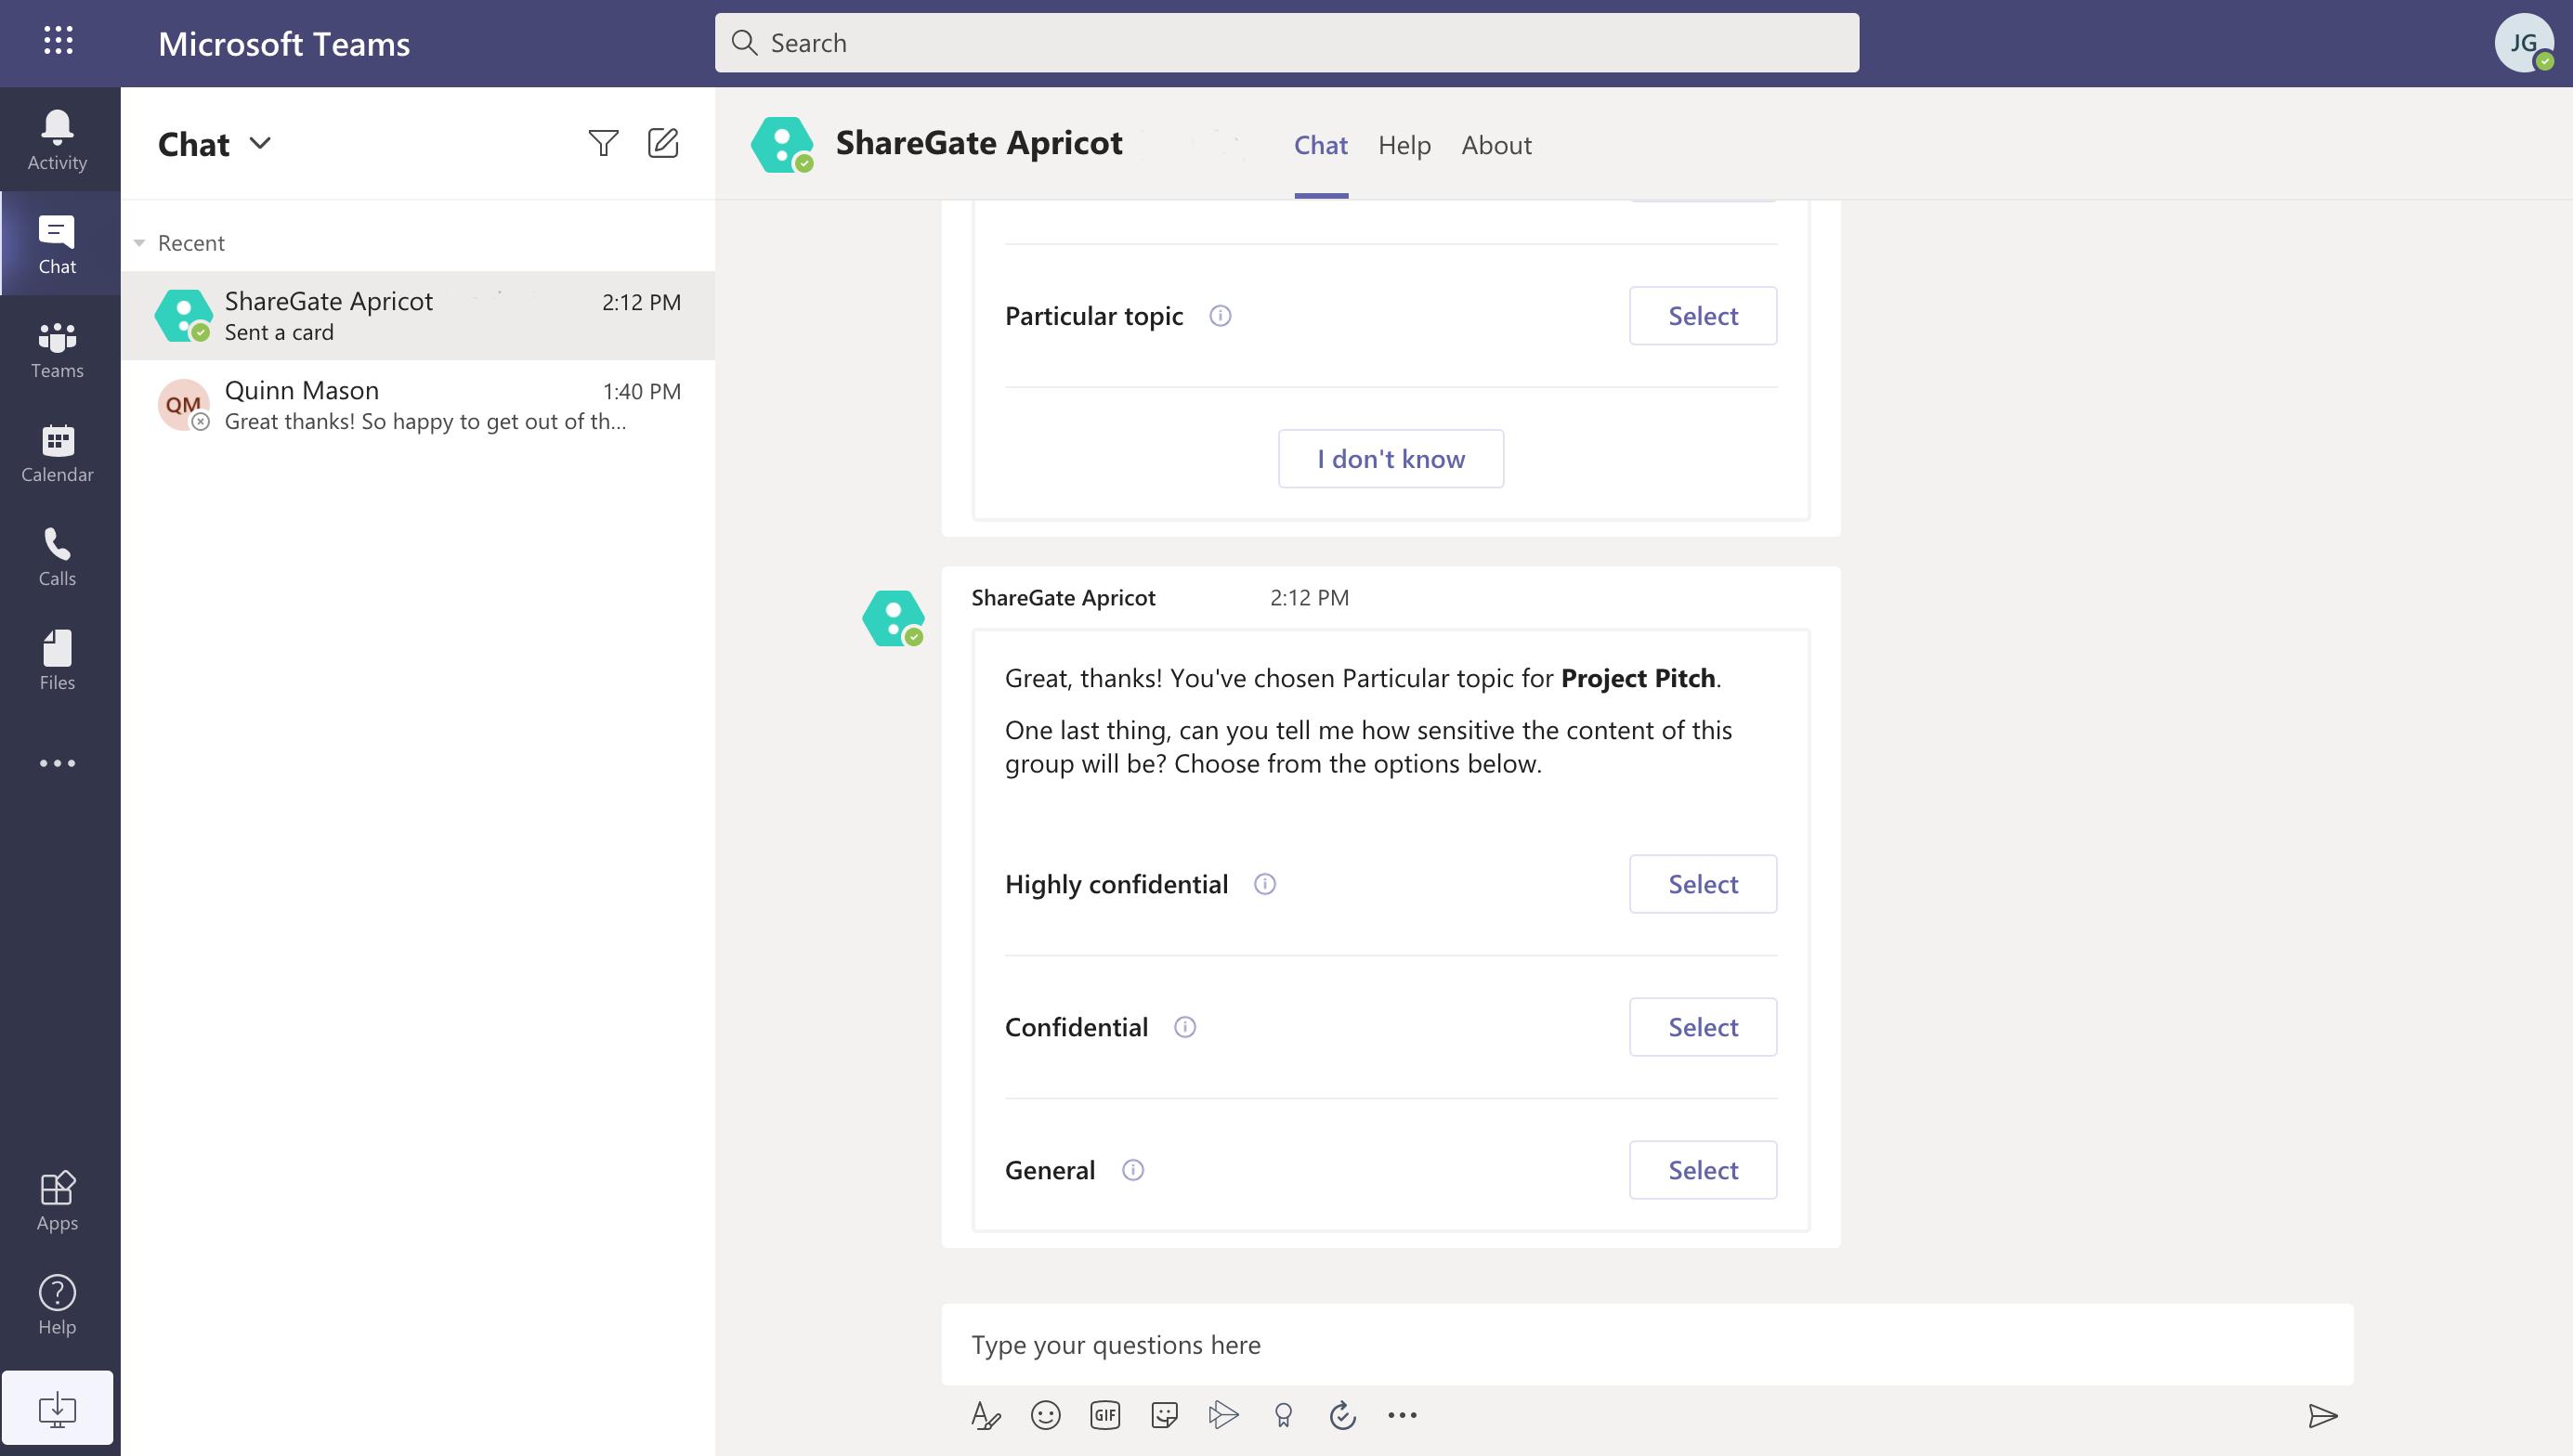 Screenshot of bot conversation in Teams.